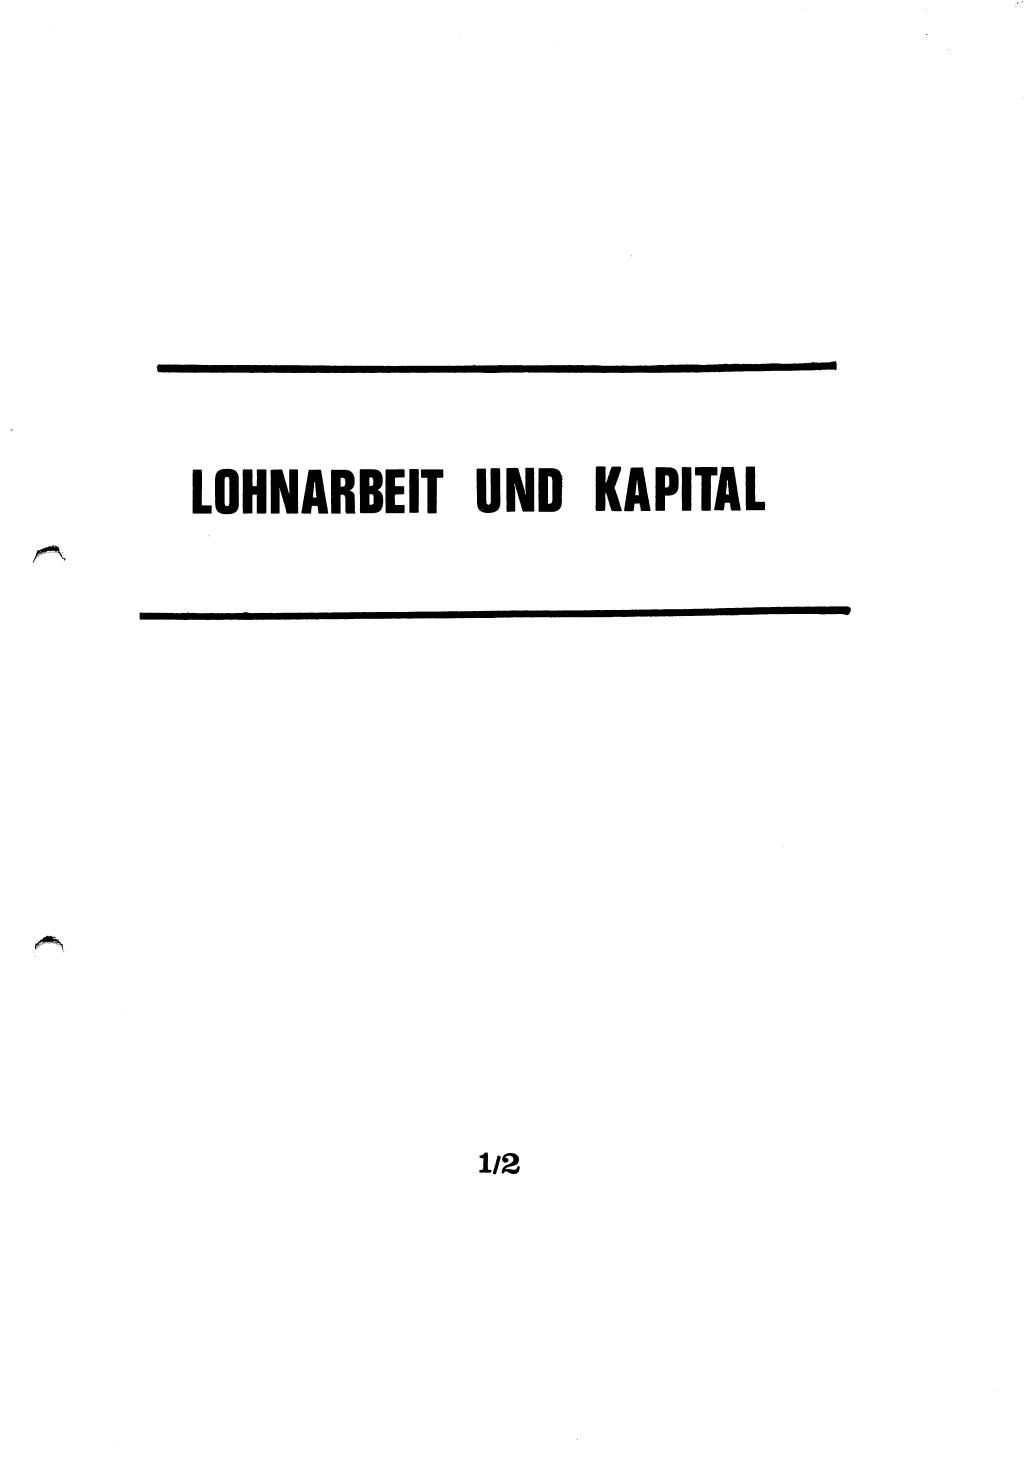 KSV_Grundschulung_1975_01_21